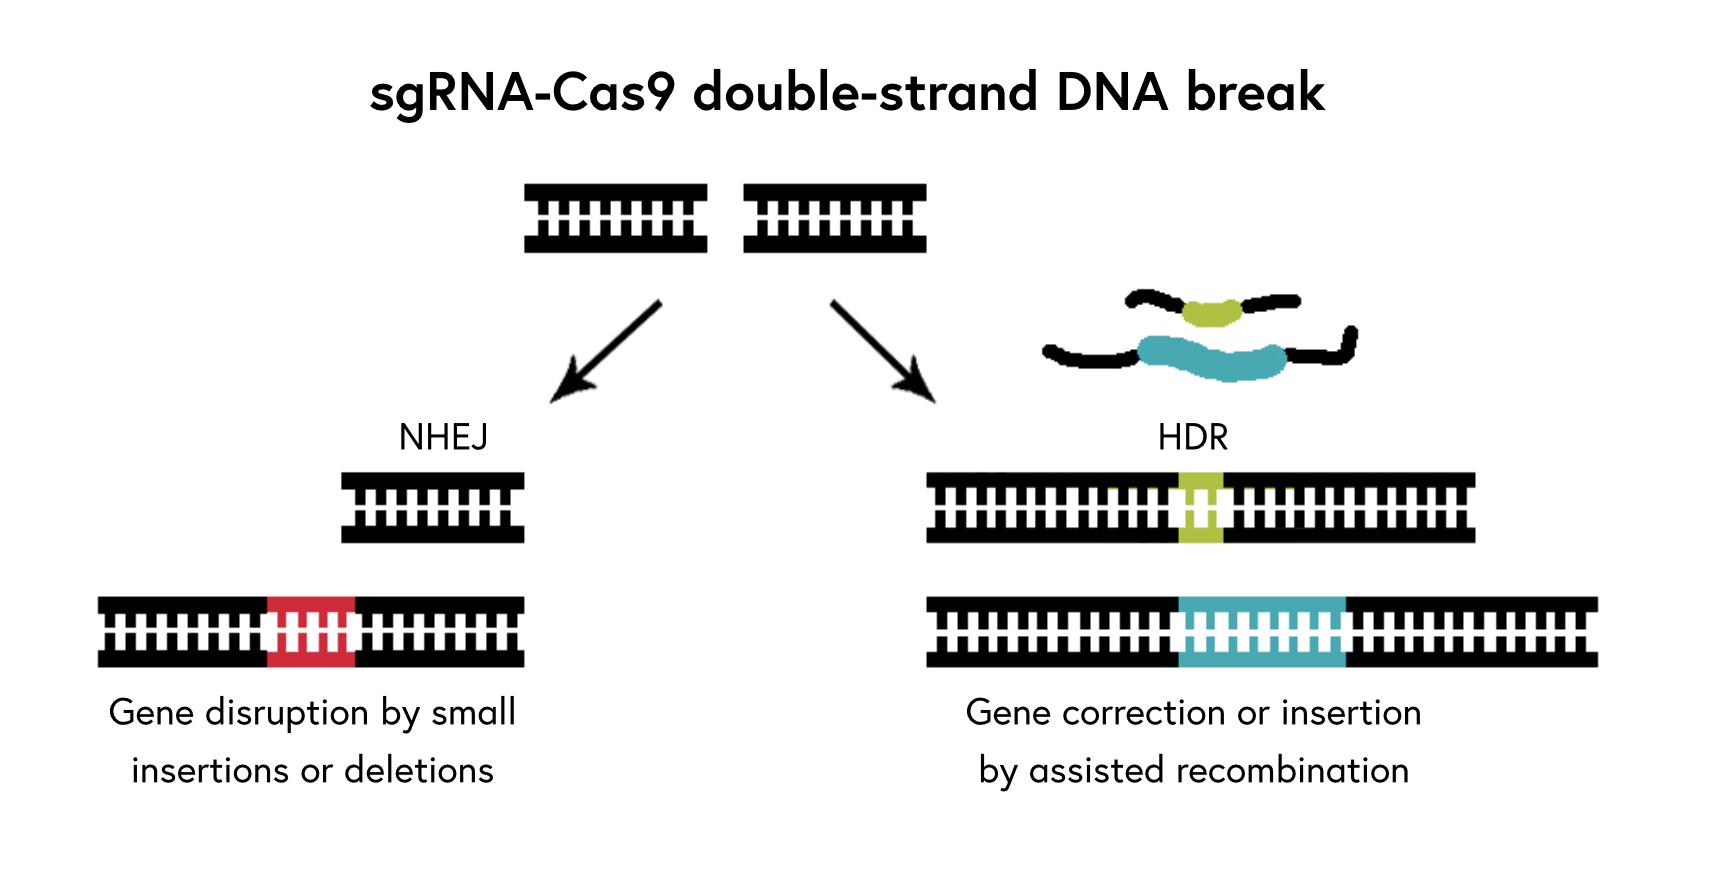 sgRNA-Cas9 double-strand DNA break image